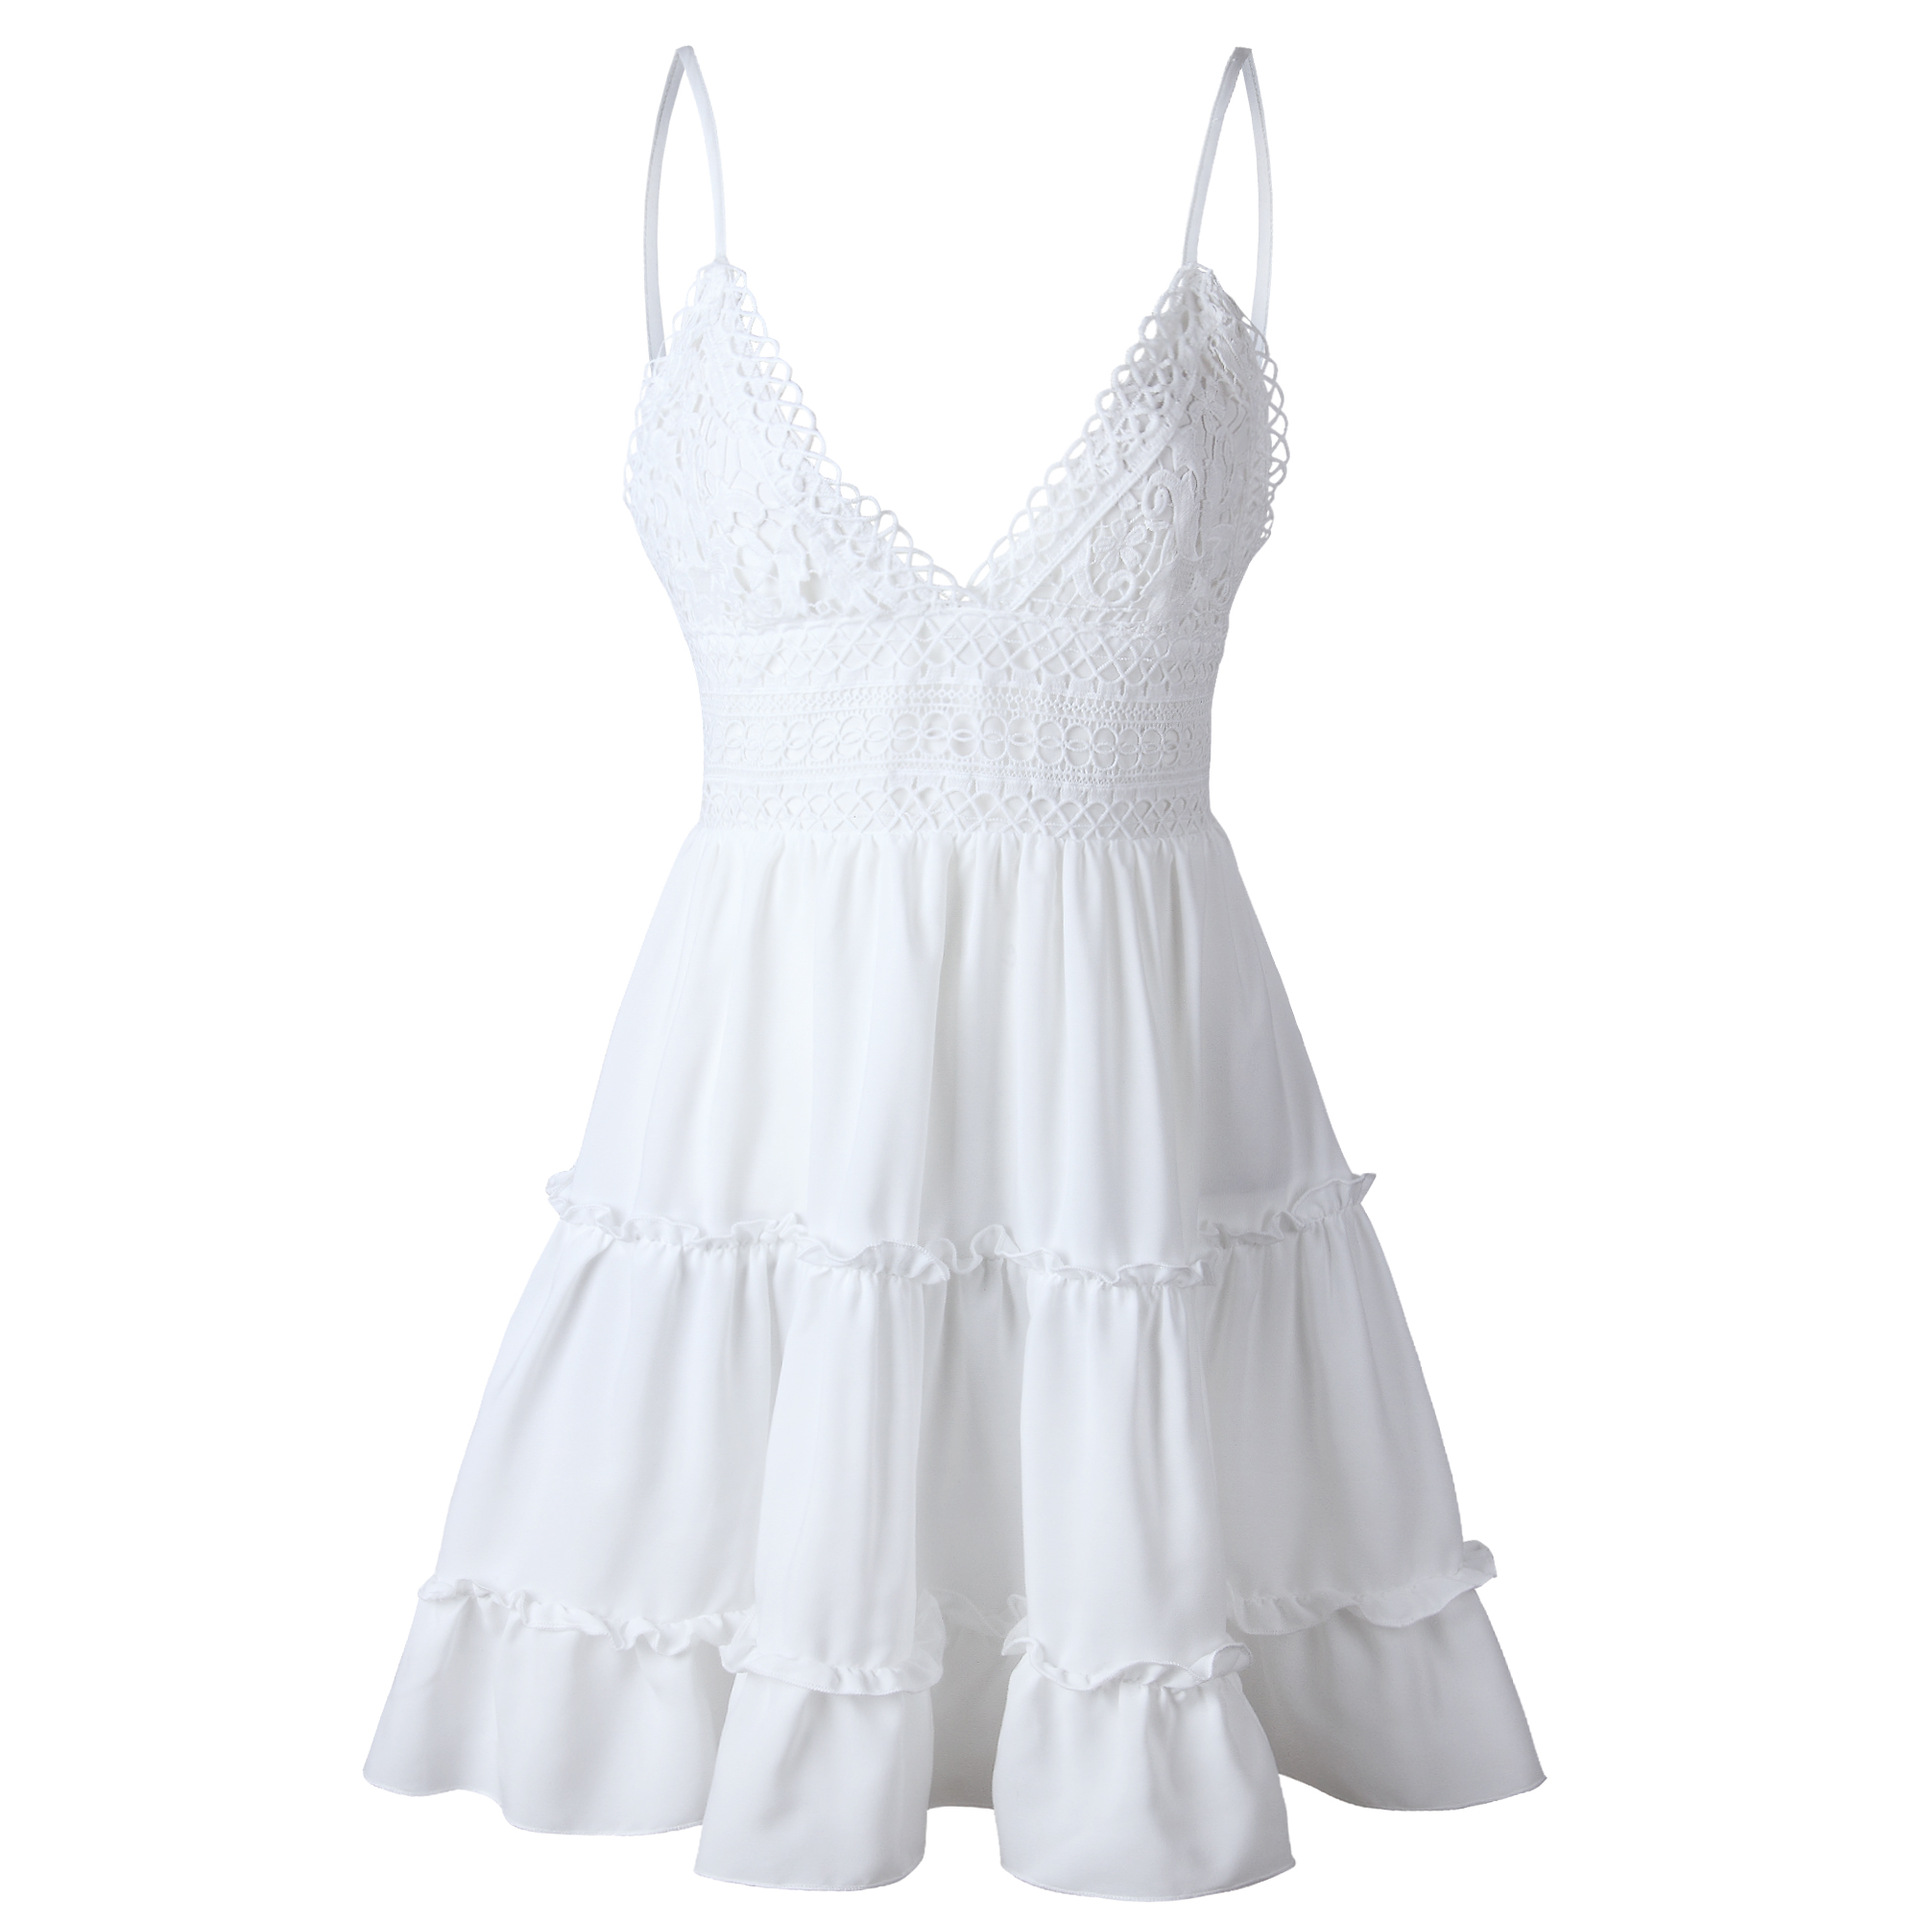 Summer Women Lace Dress Sexy Backless V neck Beach Dresses 2018 Fashion Sleeveless Spaghetti Strap White